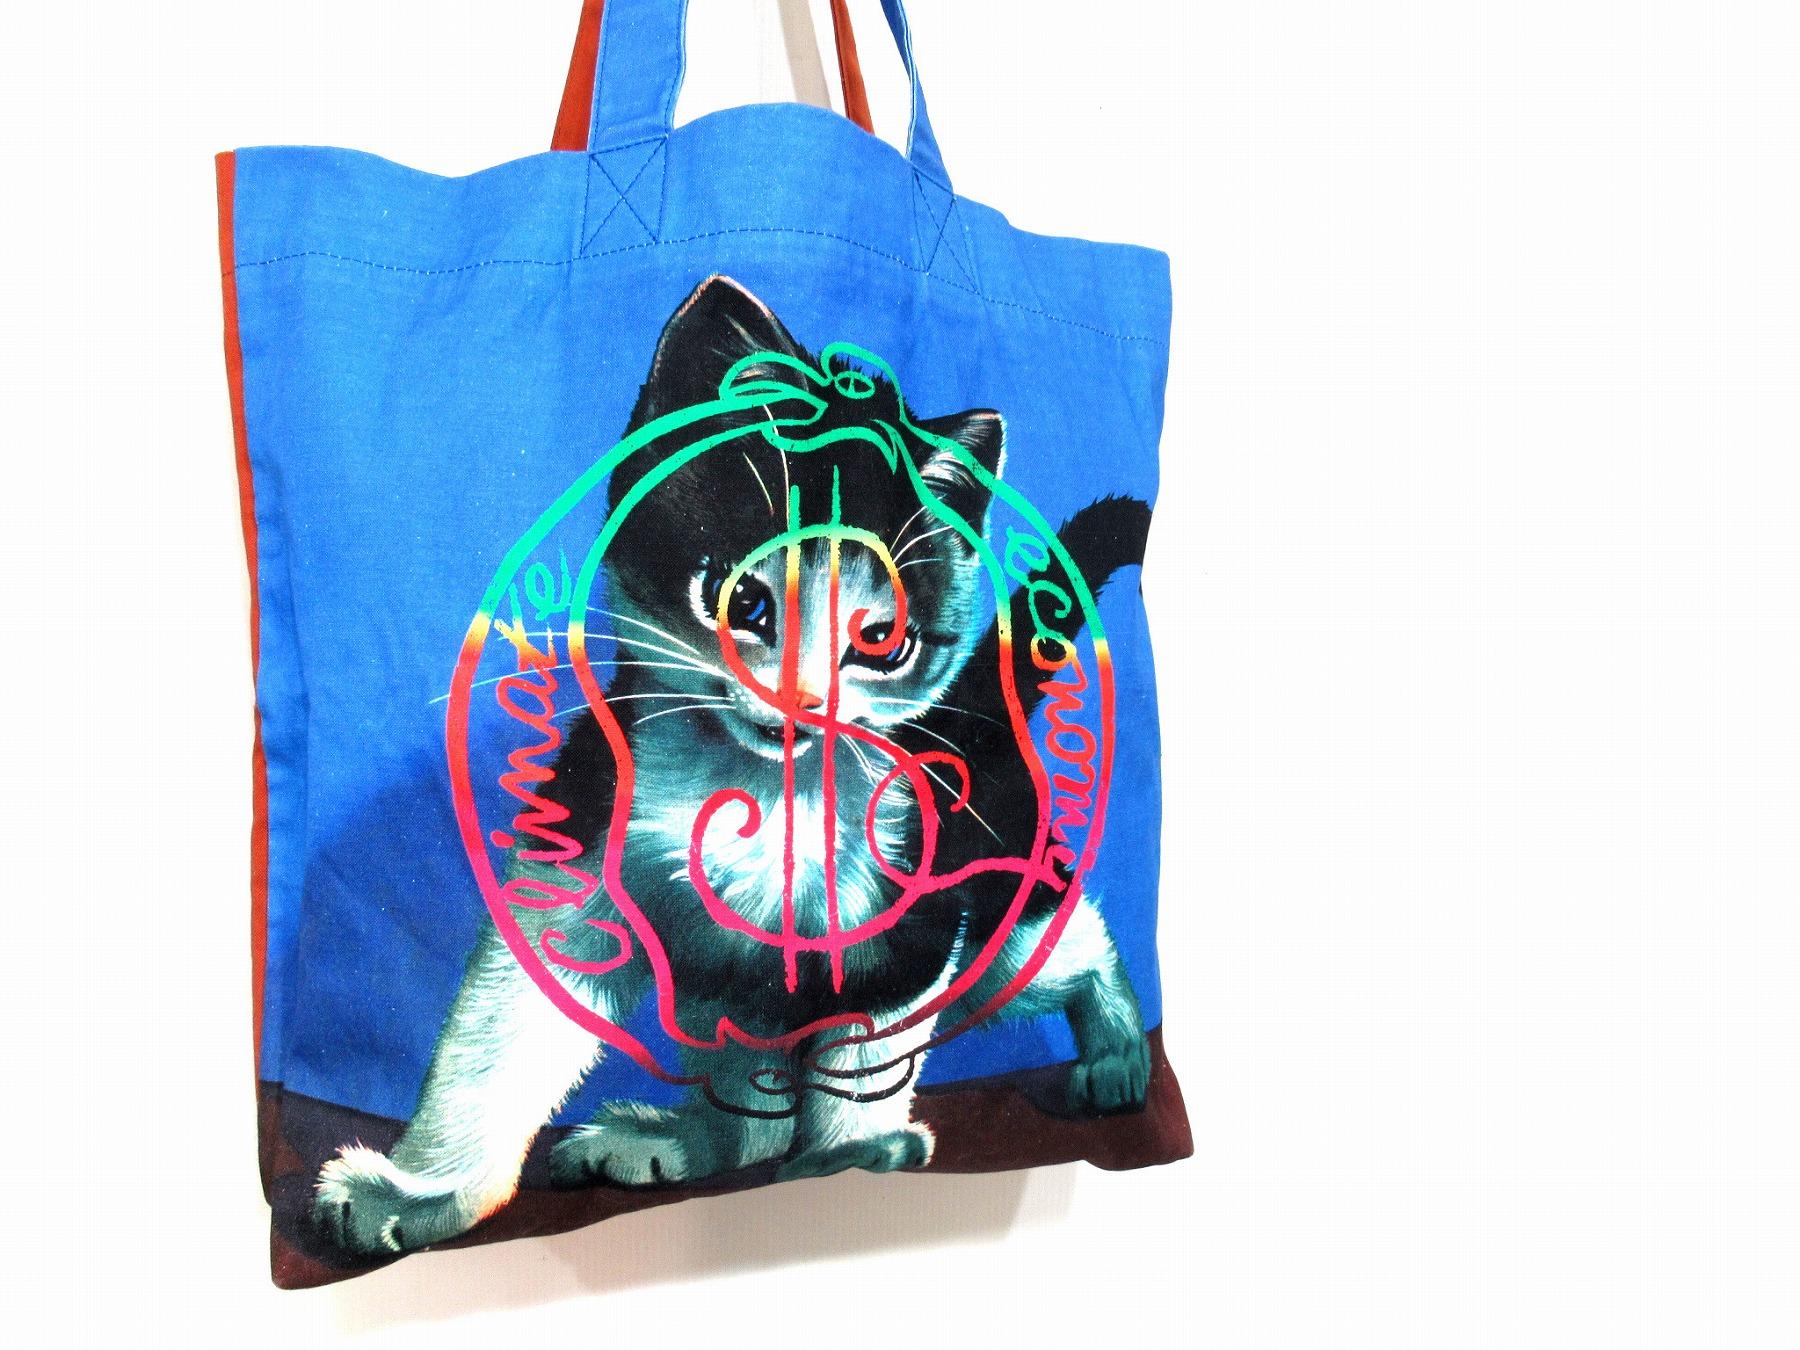 Vivienne Westwood(ヴィヴィアン・ウエストウッド)より普段使いしやすいプリントトートバッグが入荷